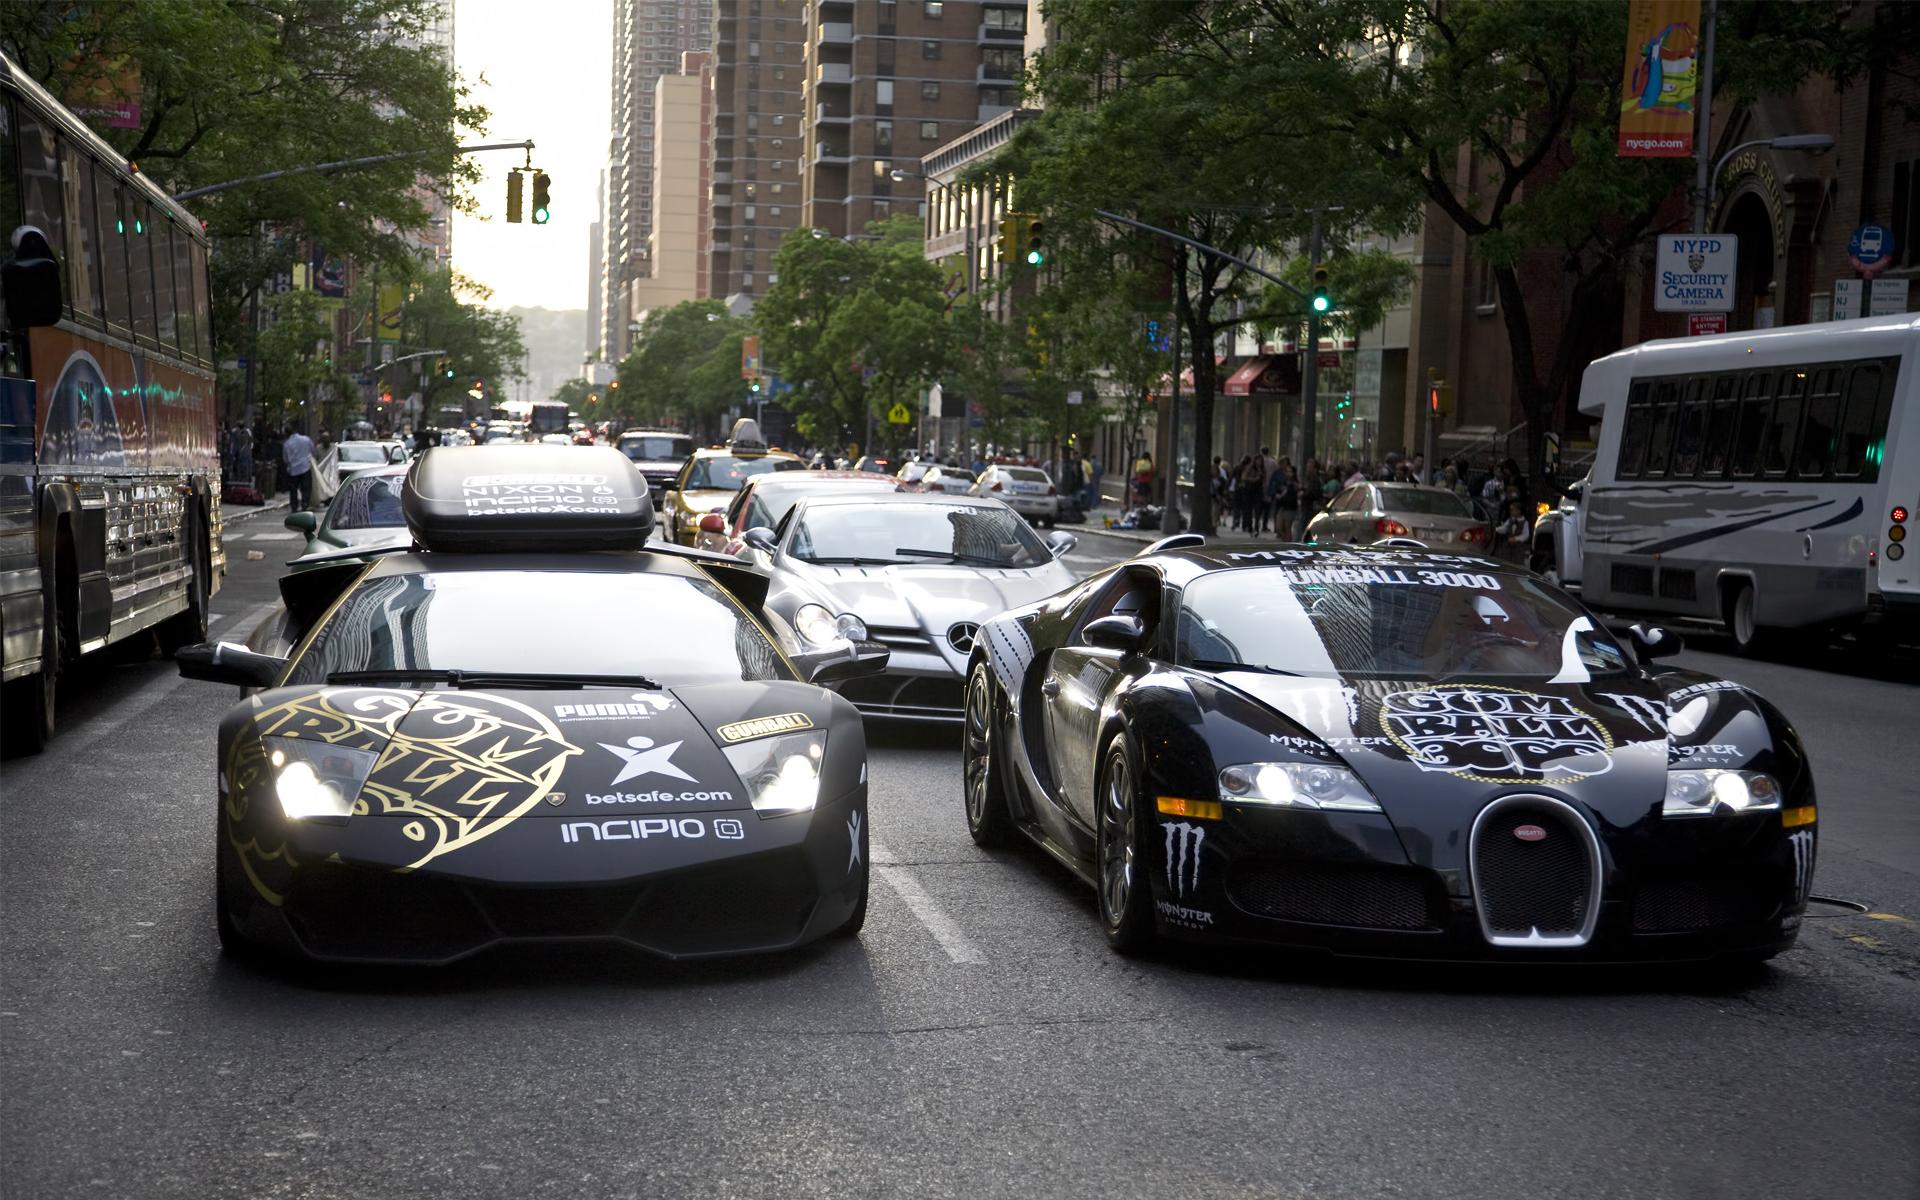 улица, дорога, спорткары